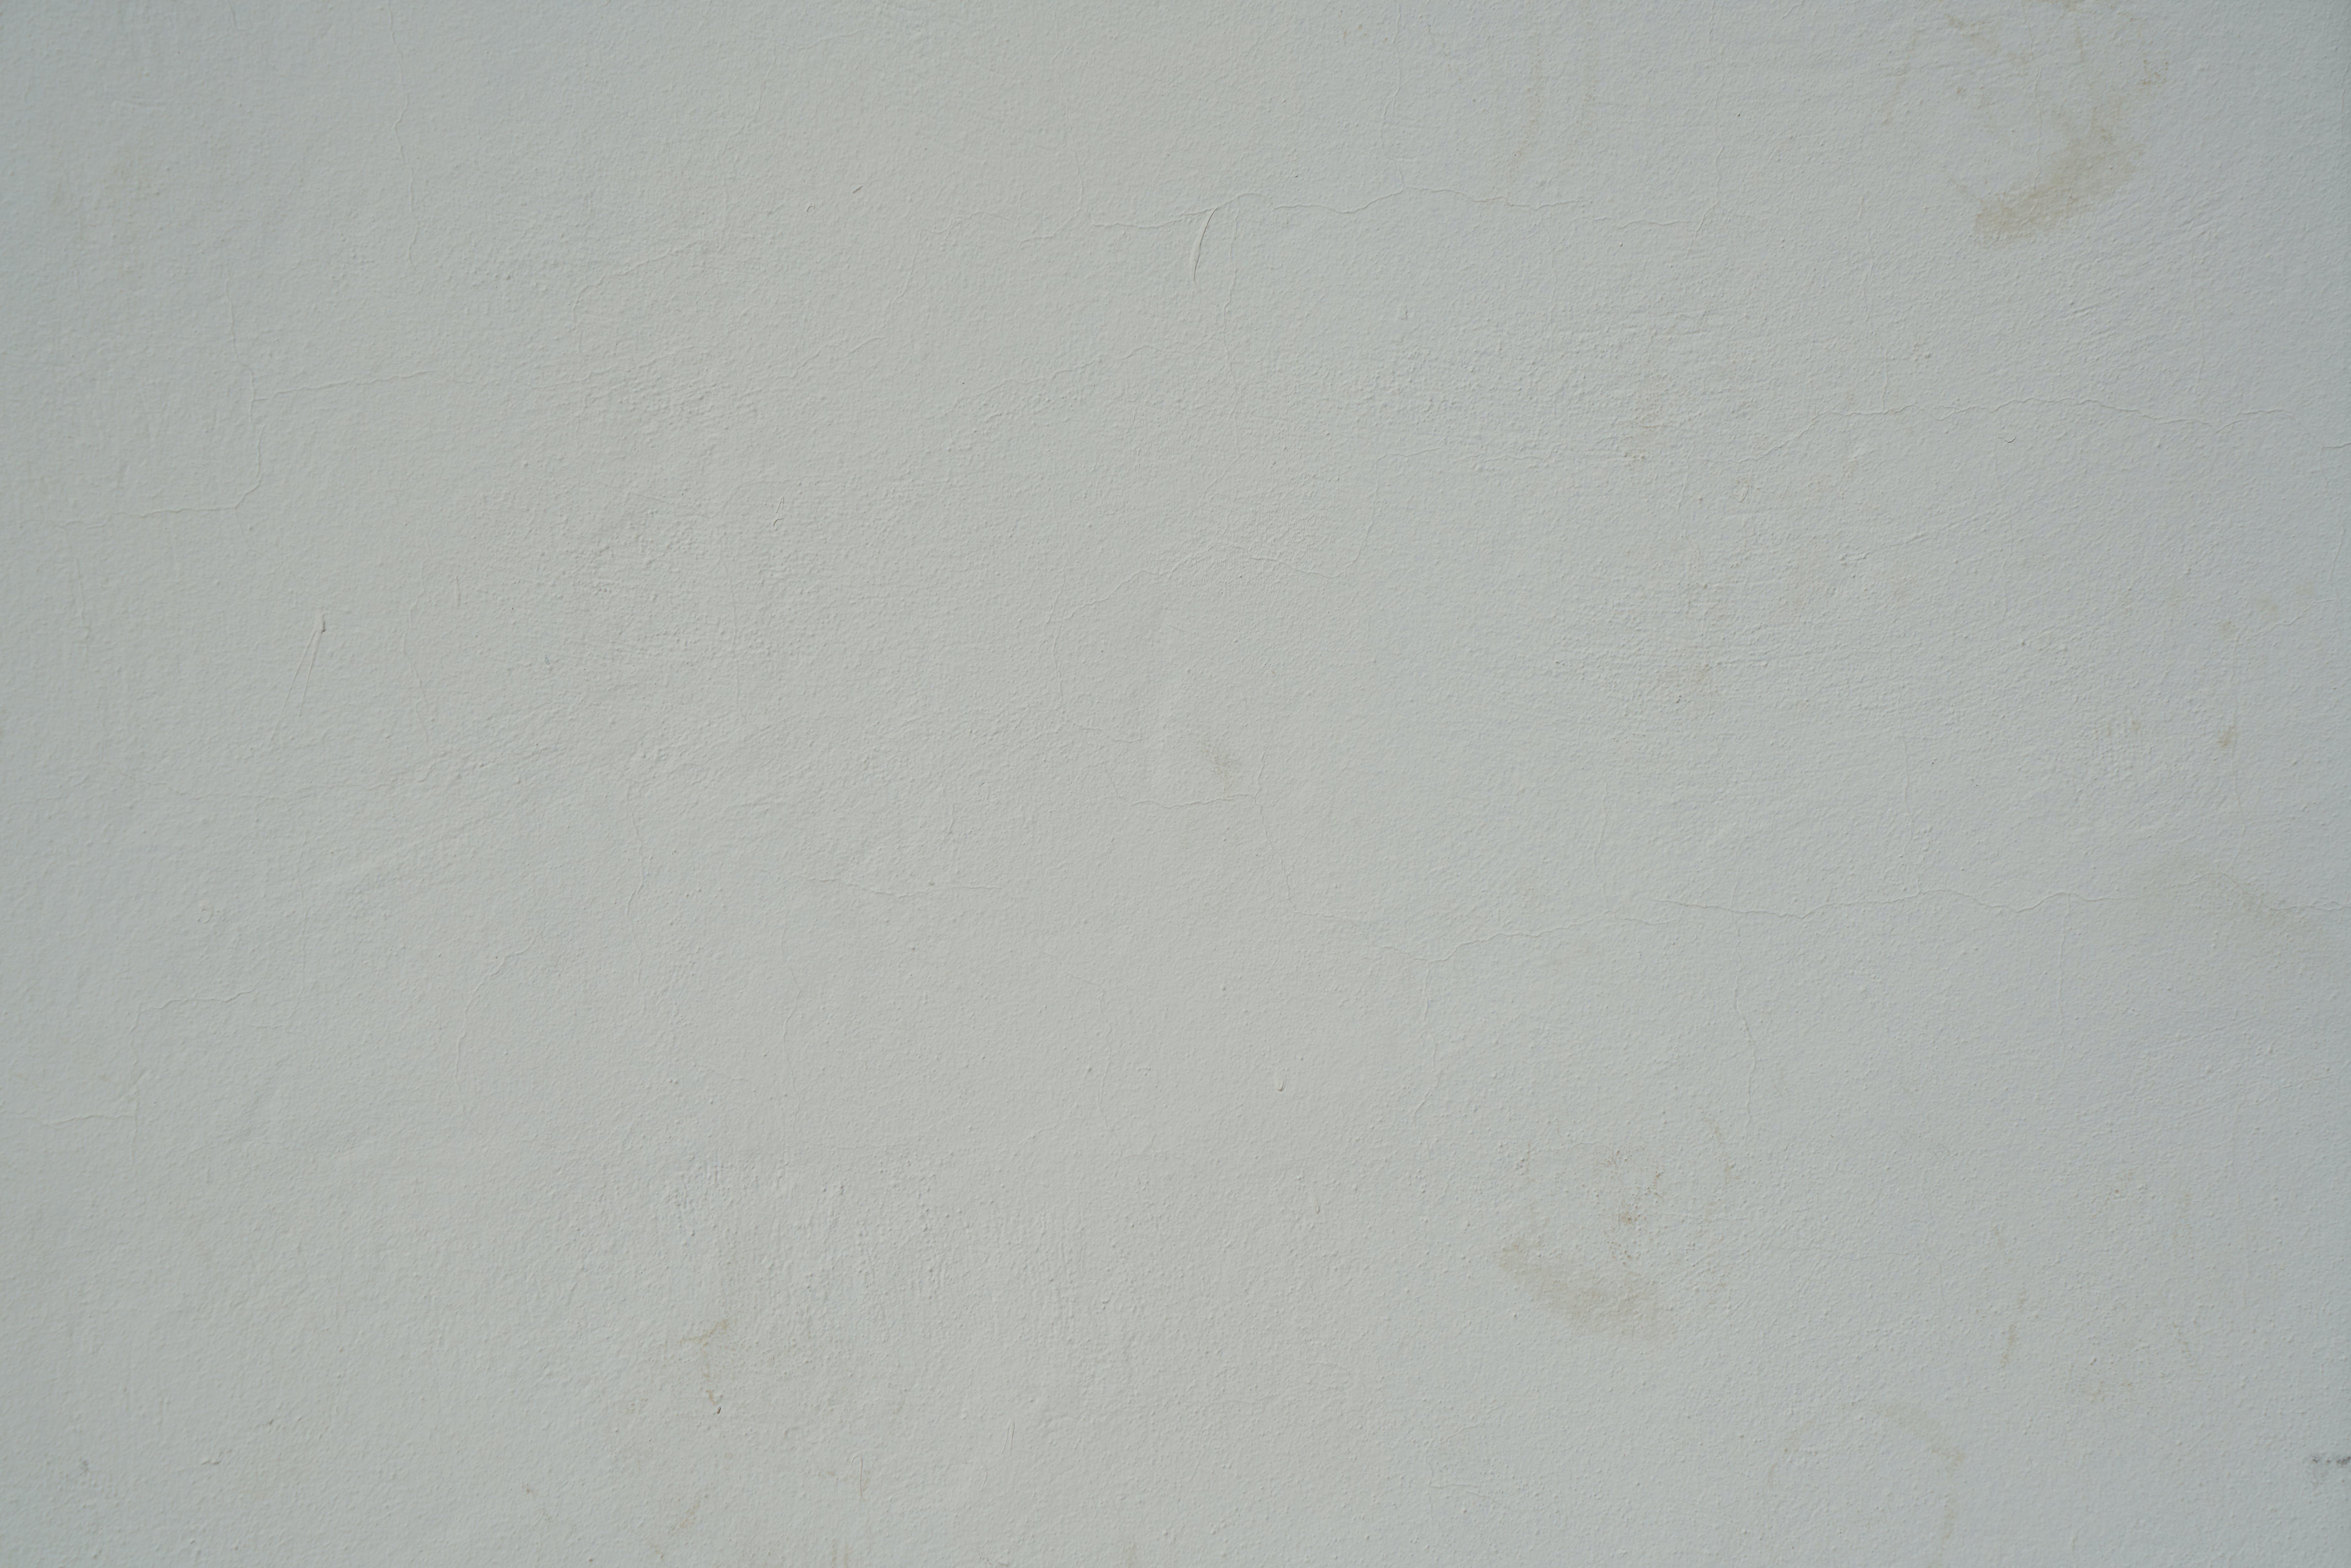 Free stock photo of background, close up, gray, pattern